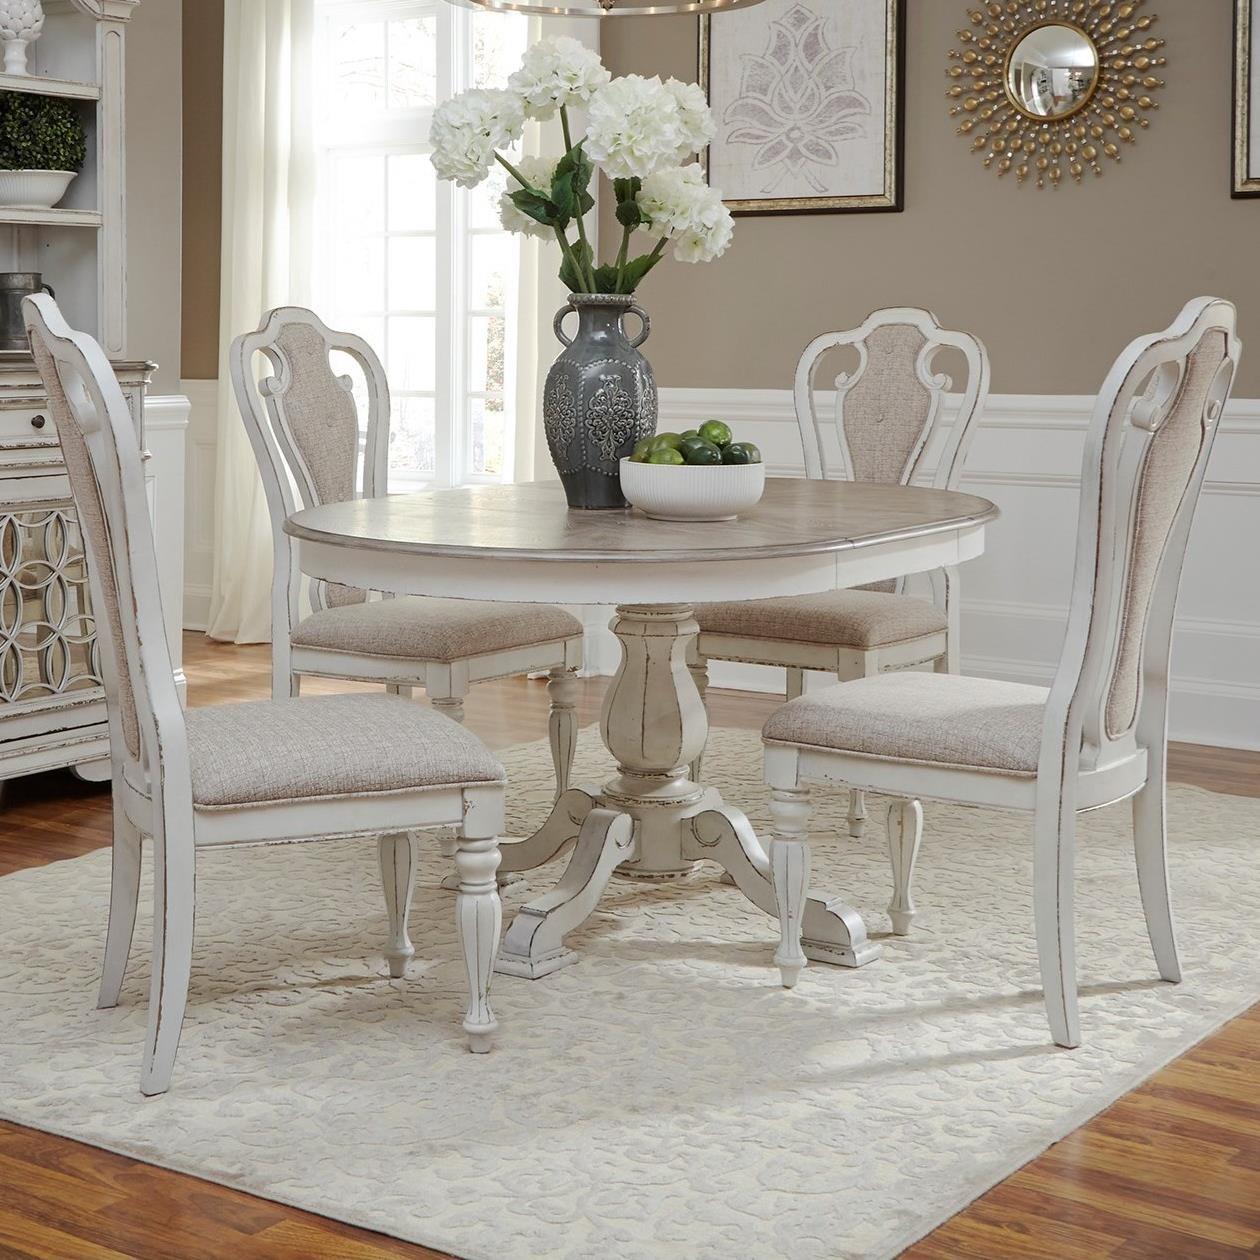 Magnolia Manor 5 Piece Table Set by Liberty Furniture at Bullard Furniture